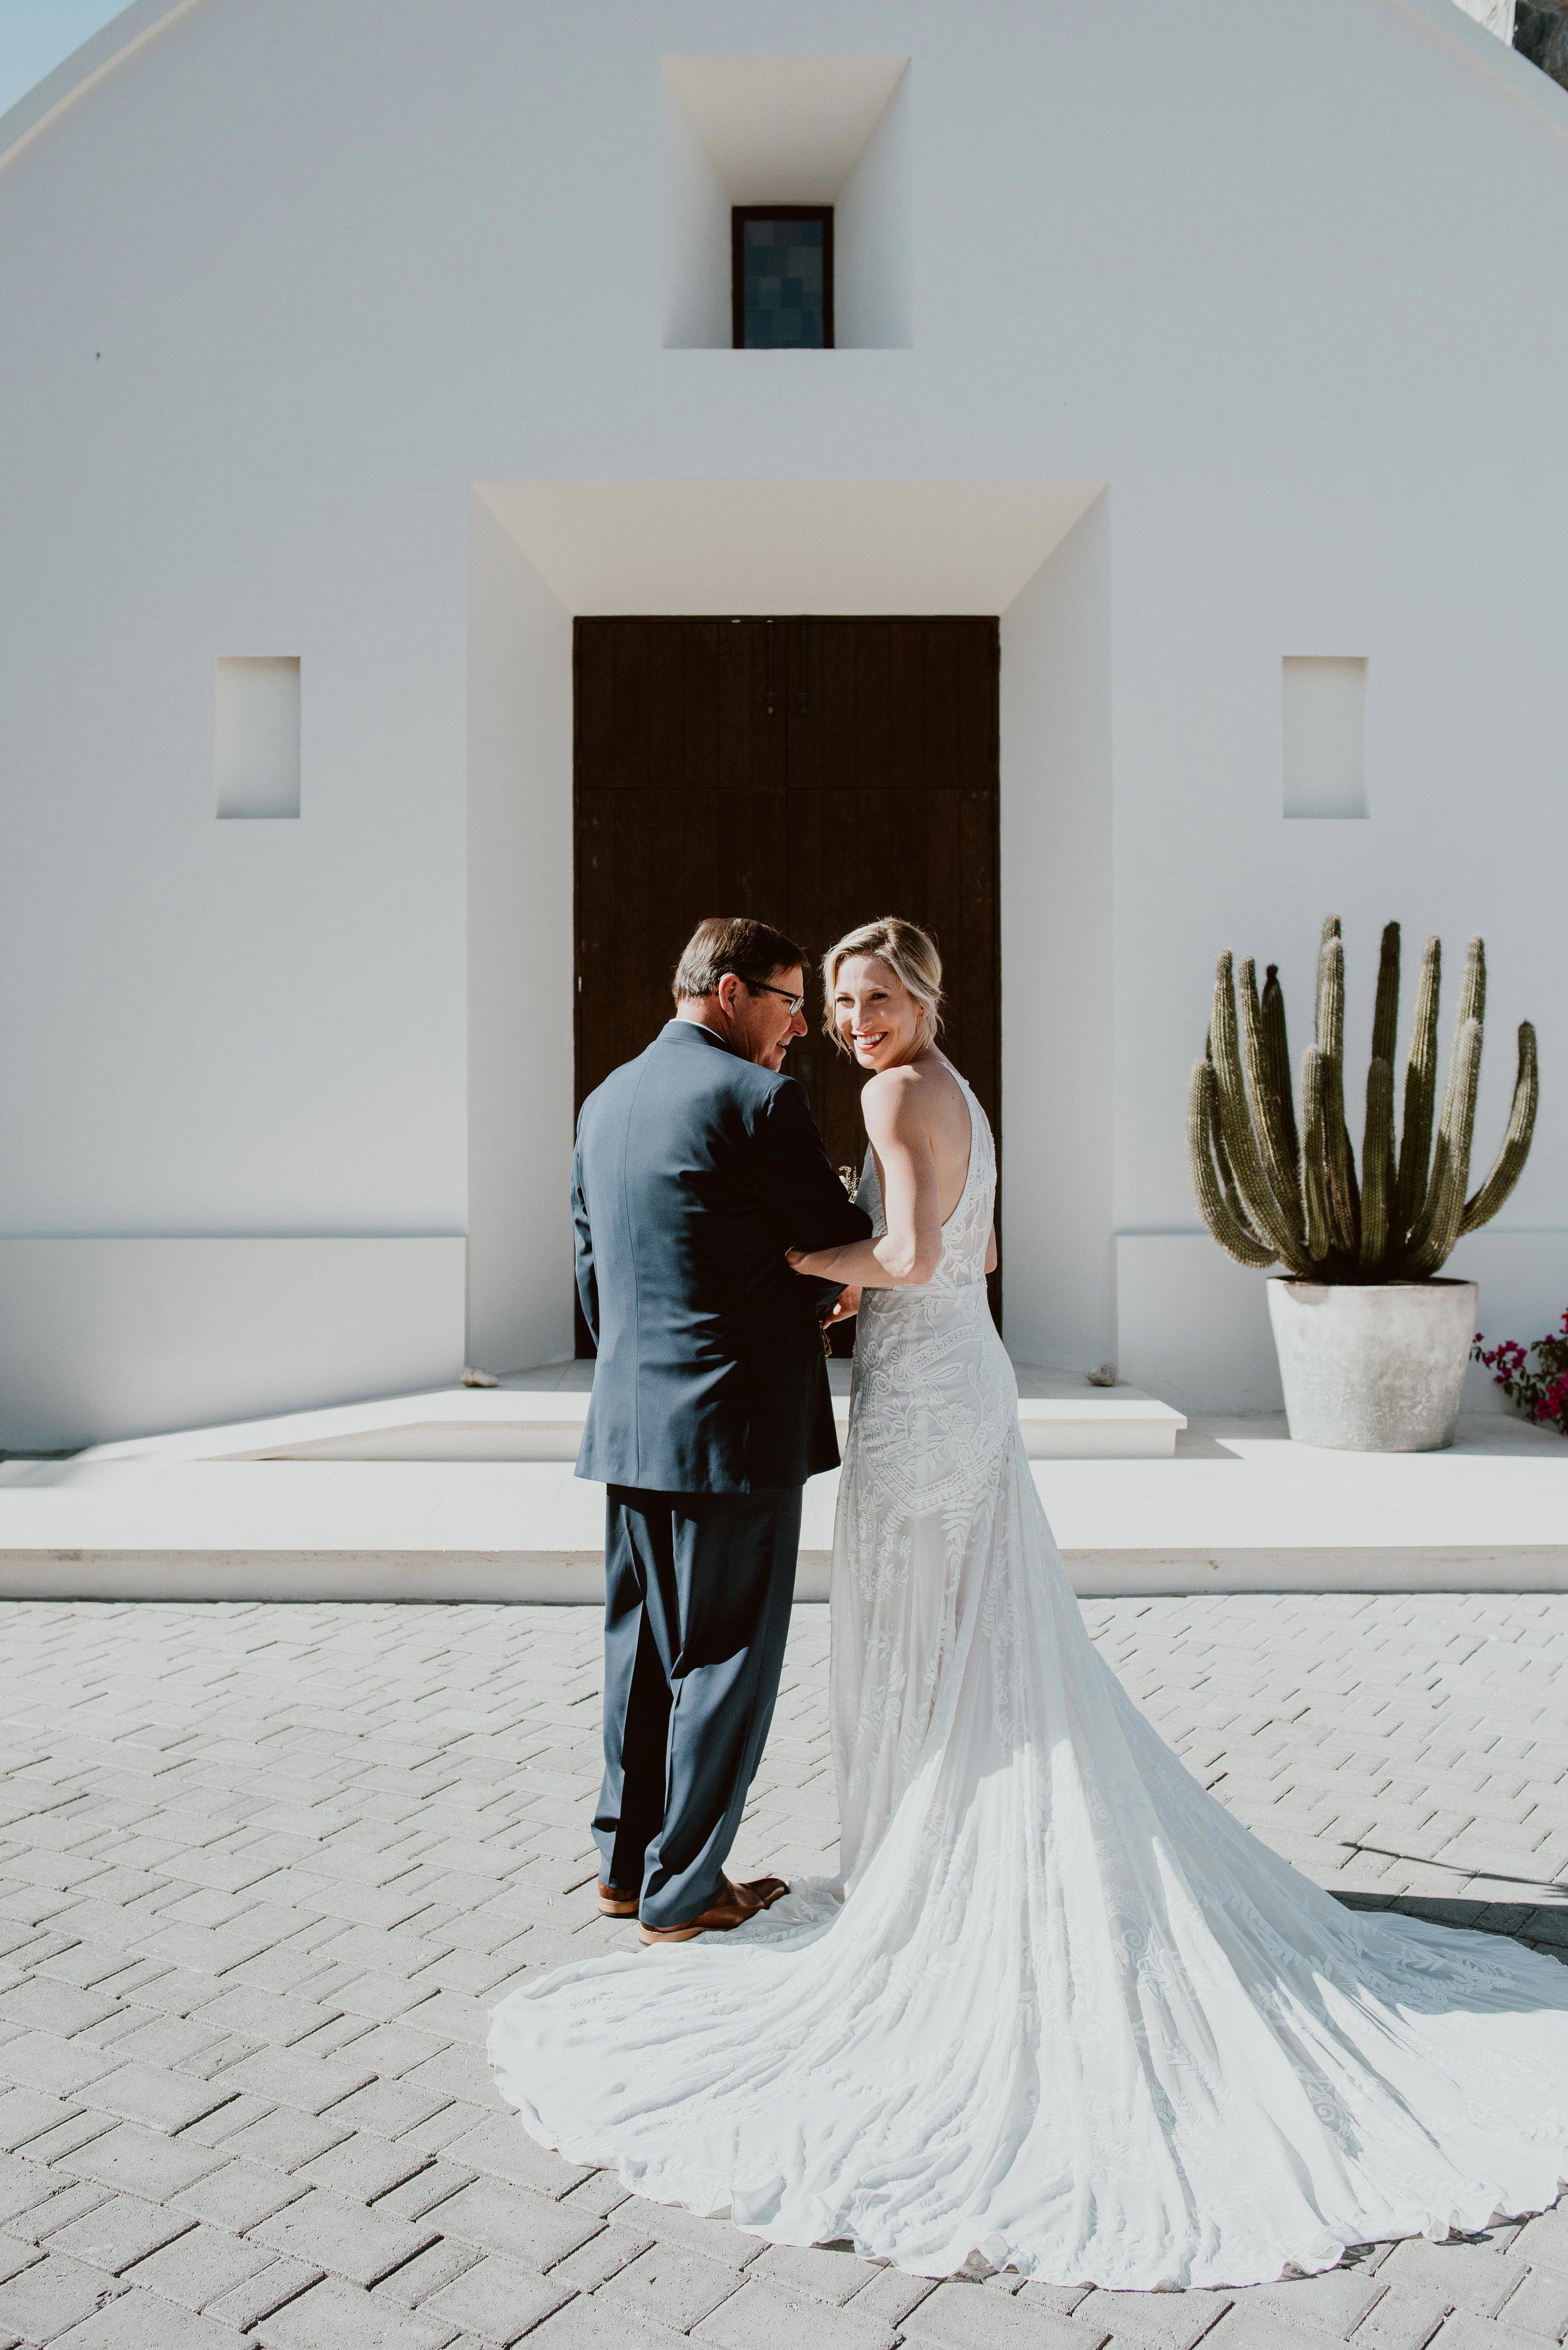 Lisa+Sam Hotel San Cristobal Wedding -193.jpg